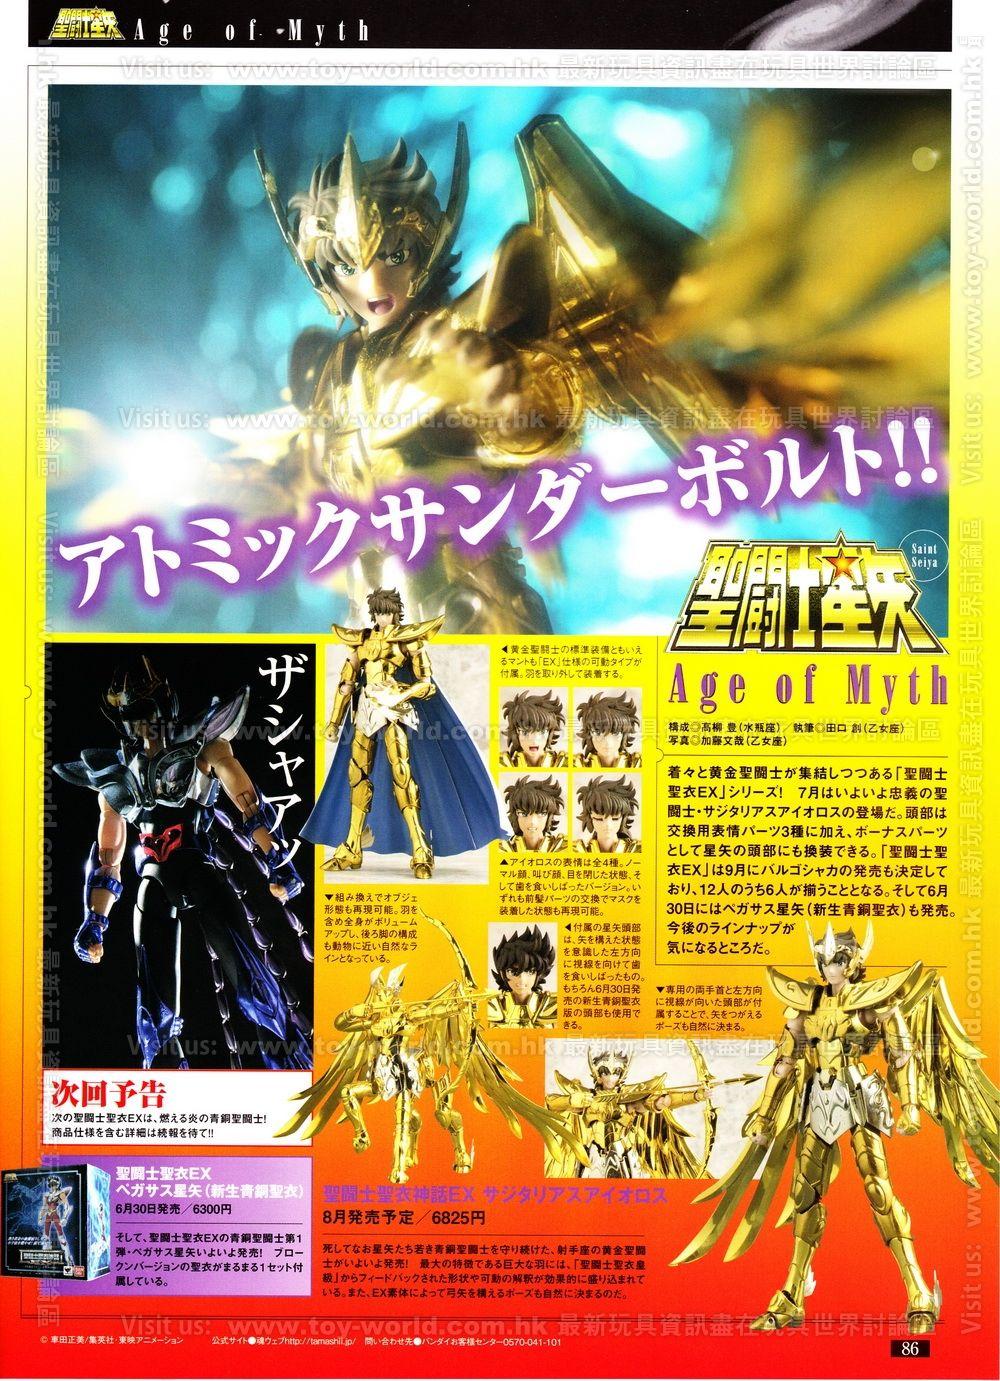 [Novembre 2012] Phoenix Ikki V2 EX - Pagina 3 AamvIAHm